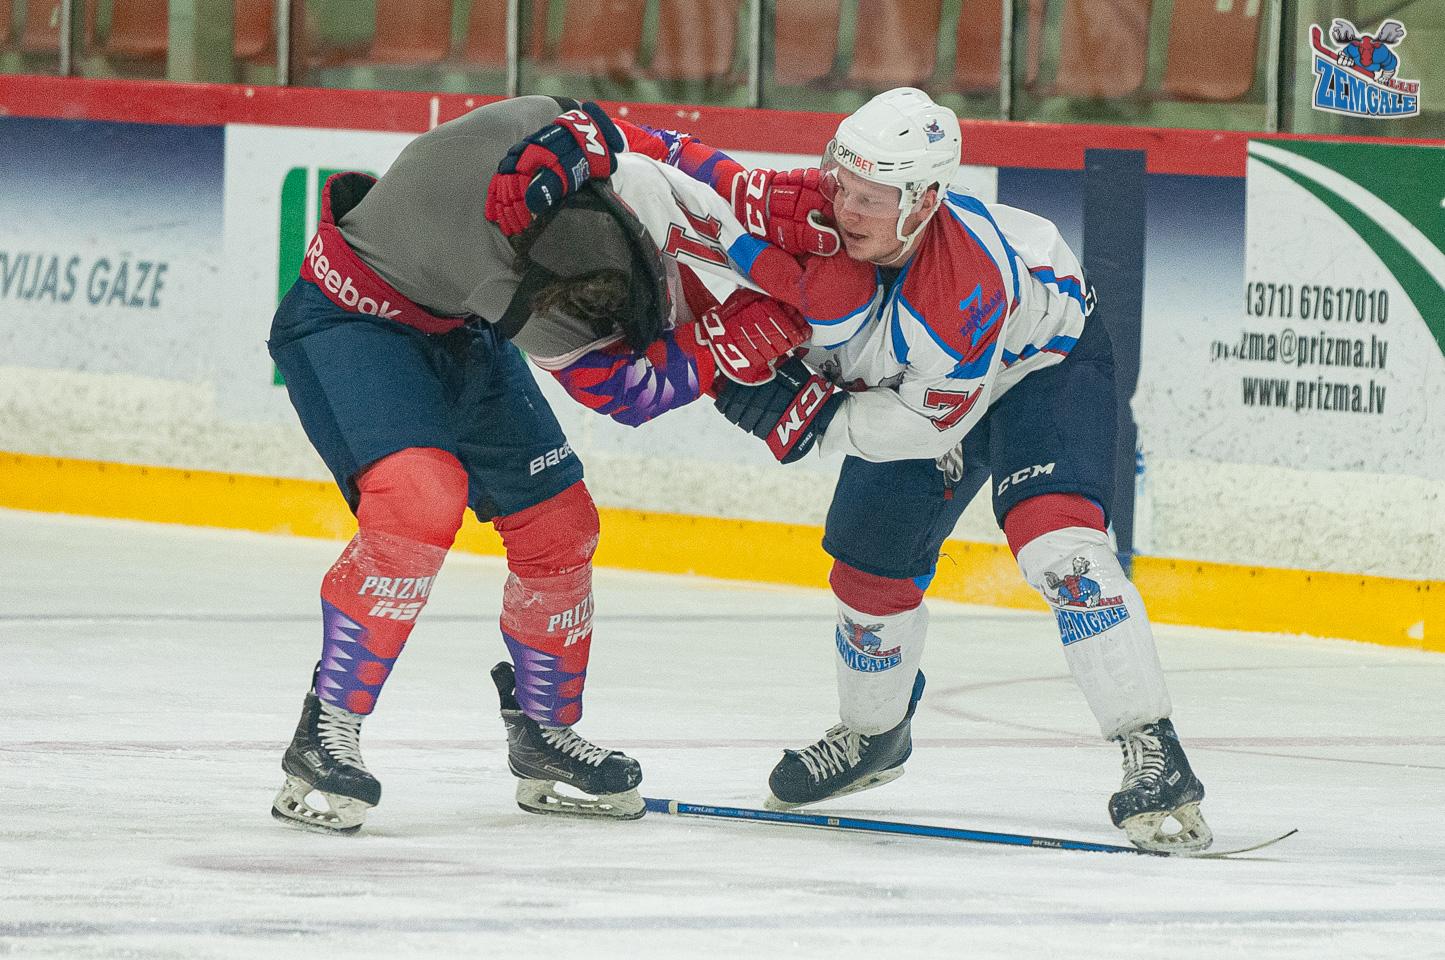 Viens hokejists otram velk nost kreklu